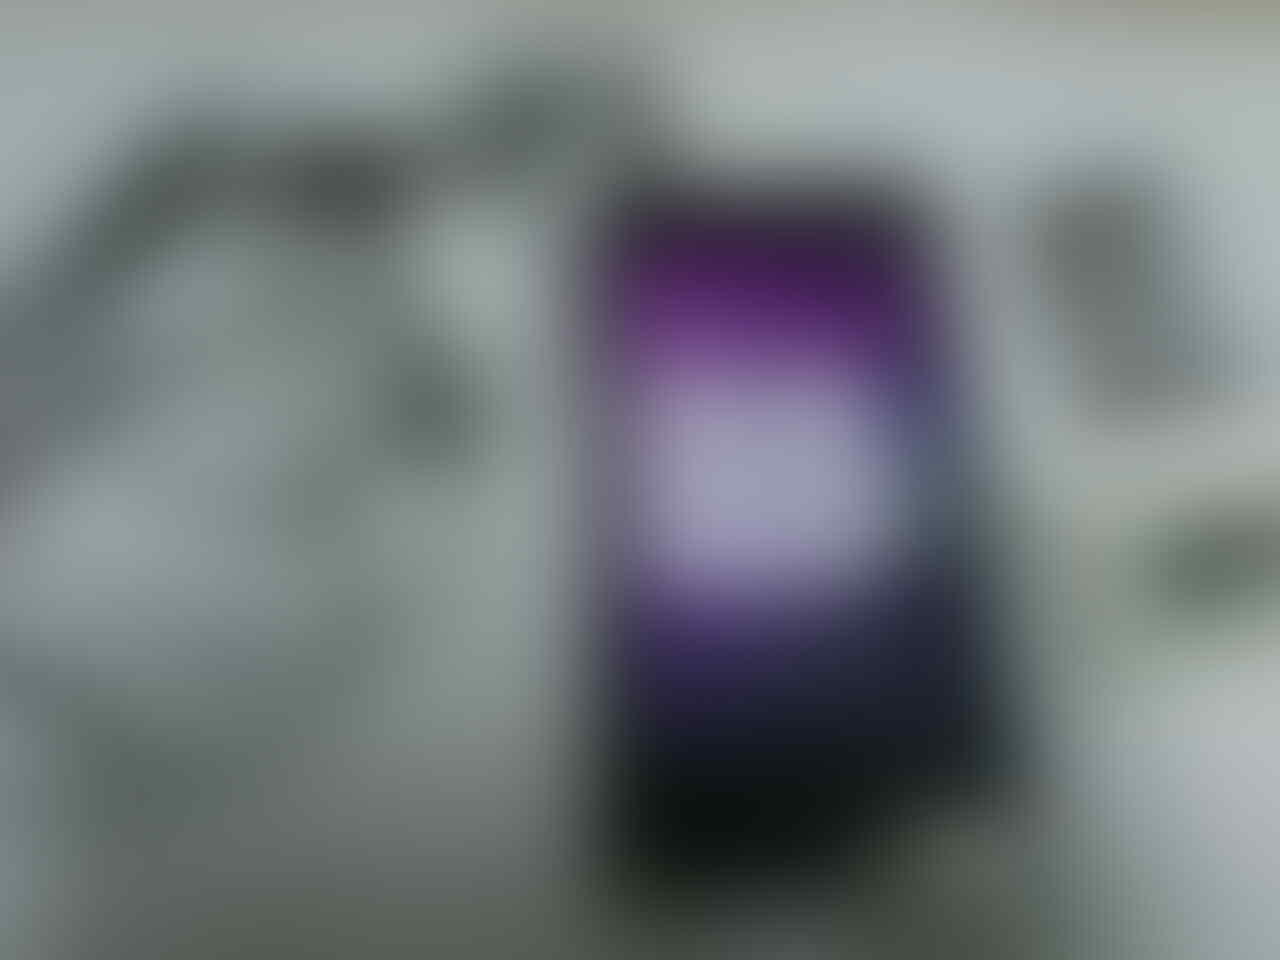 Terjual Headset Sony Xperia Mh750 Mh410c Mh650 Mh Ex300 Mh500 Mh810